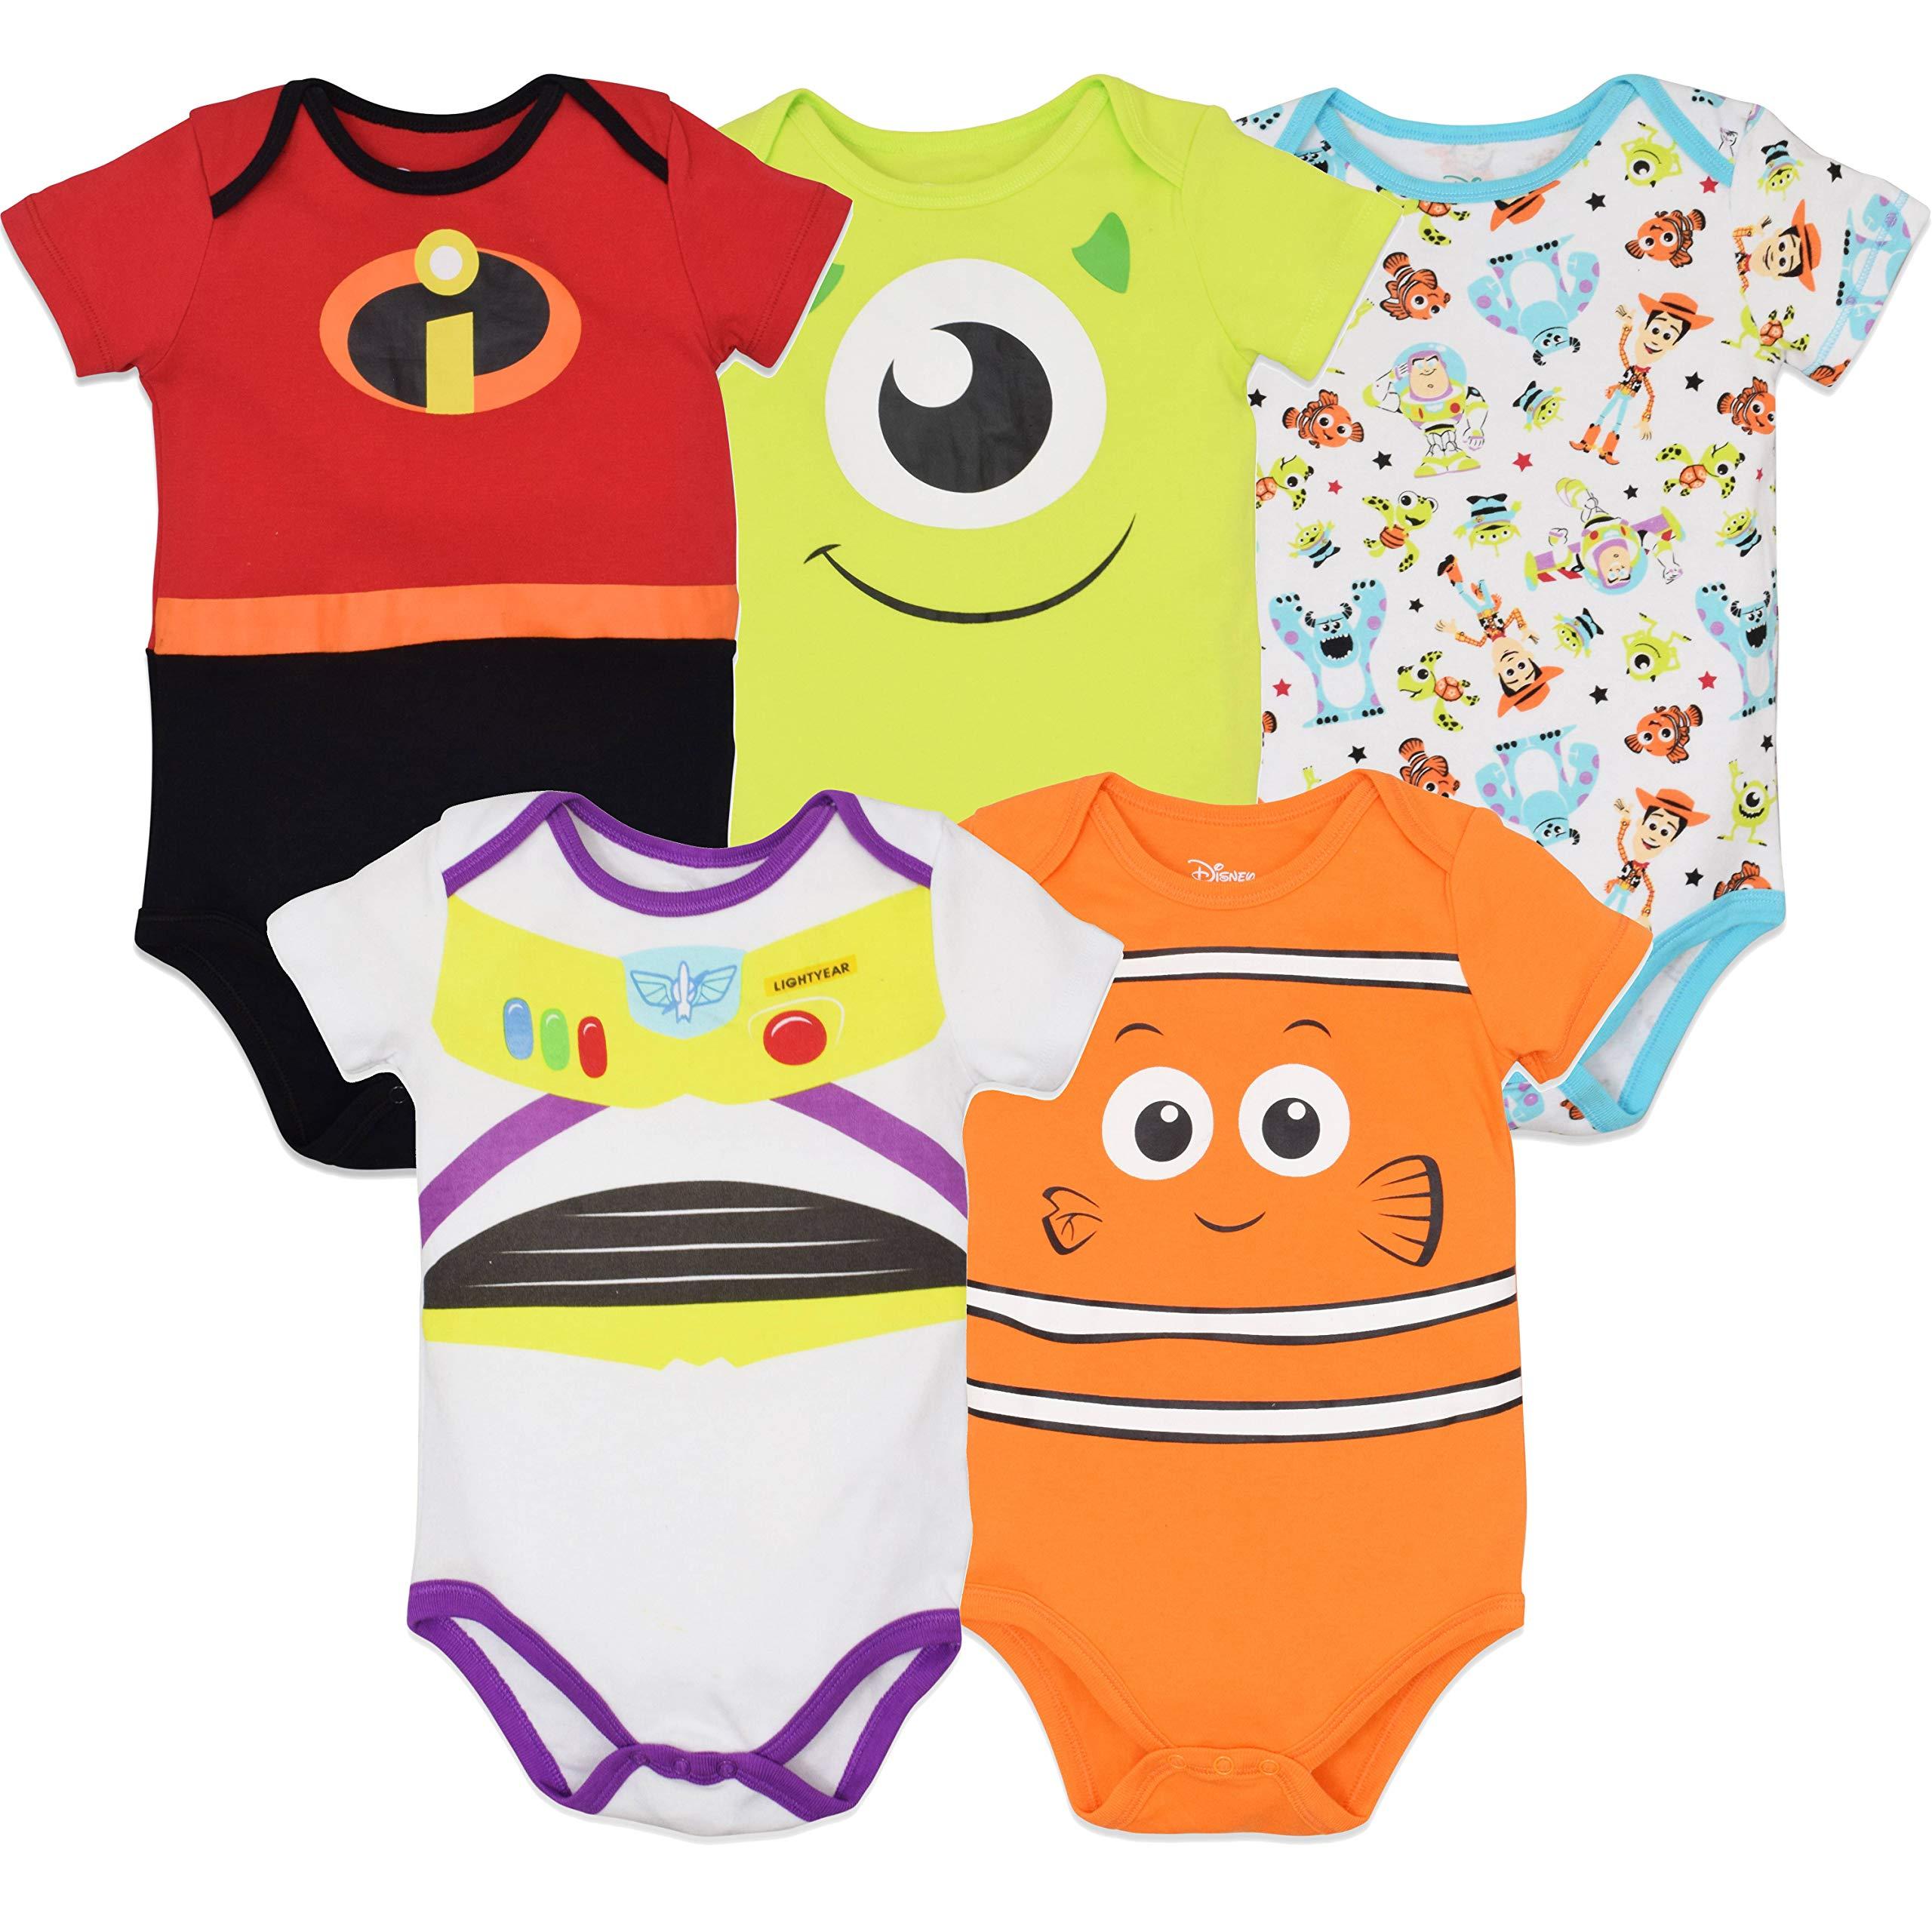 Disney Pixar Baby Boy Girl 5 Pack Bodysuits Nemo Buzz Incredibles Monsters Inc. Newborn by Disney